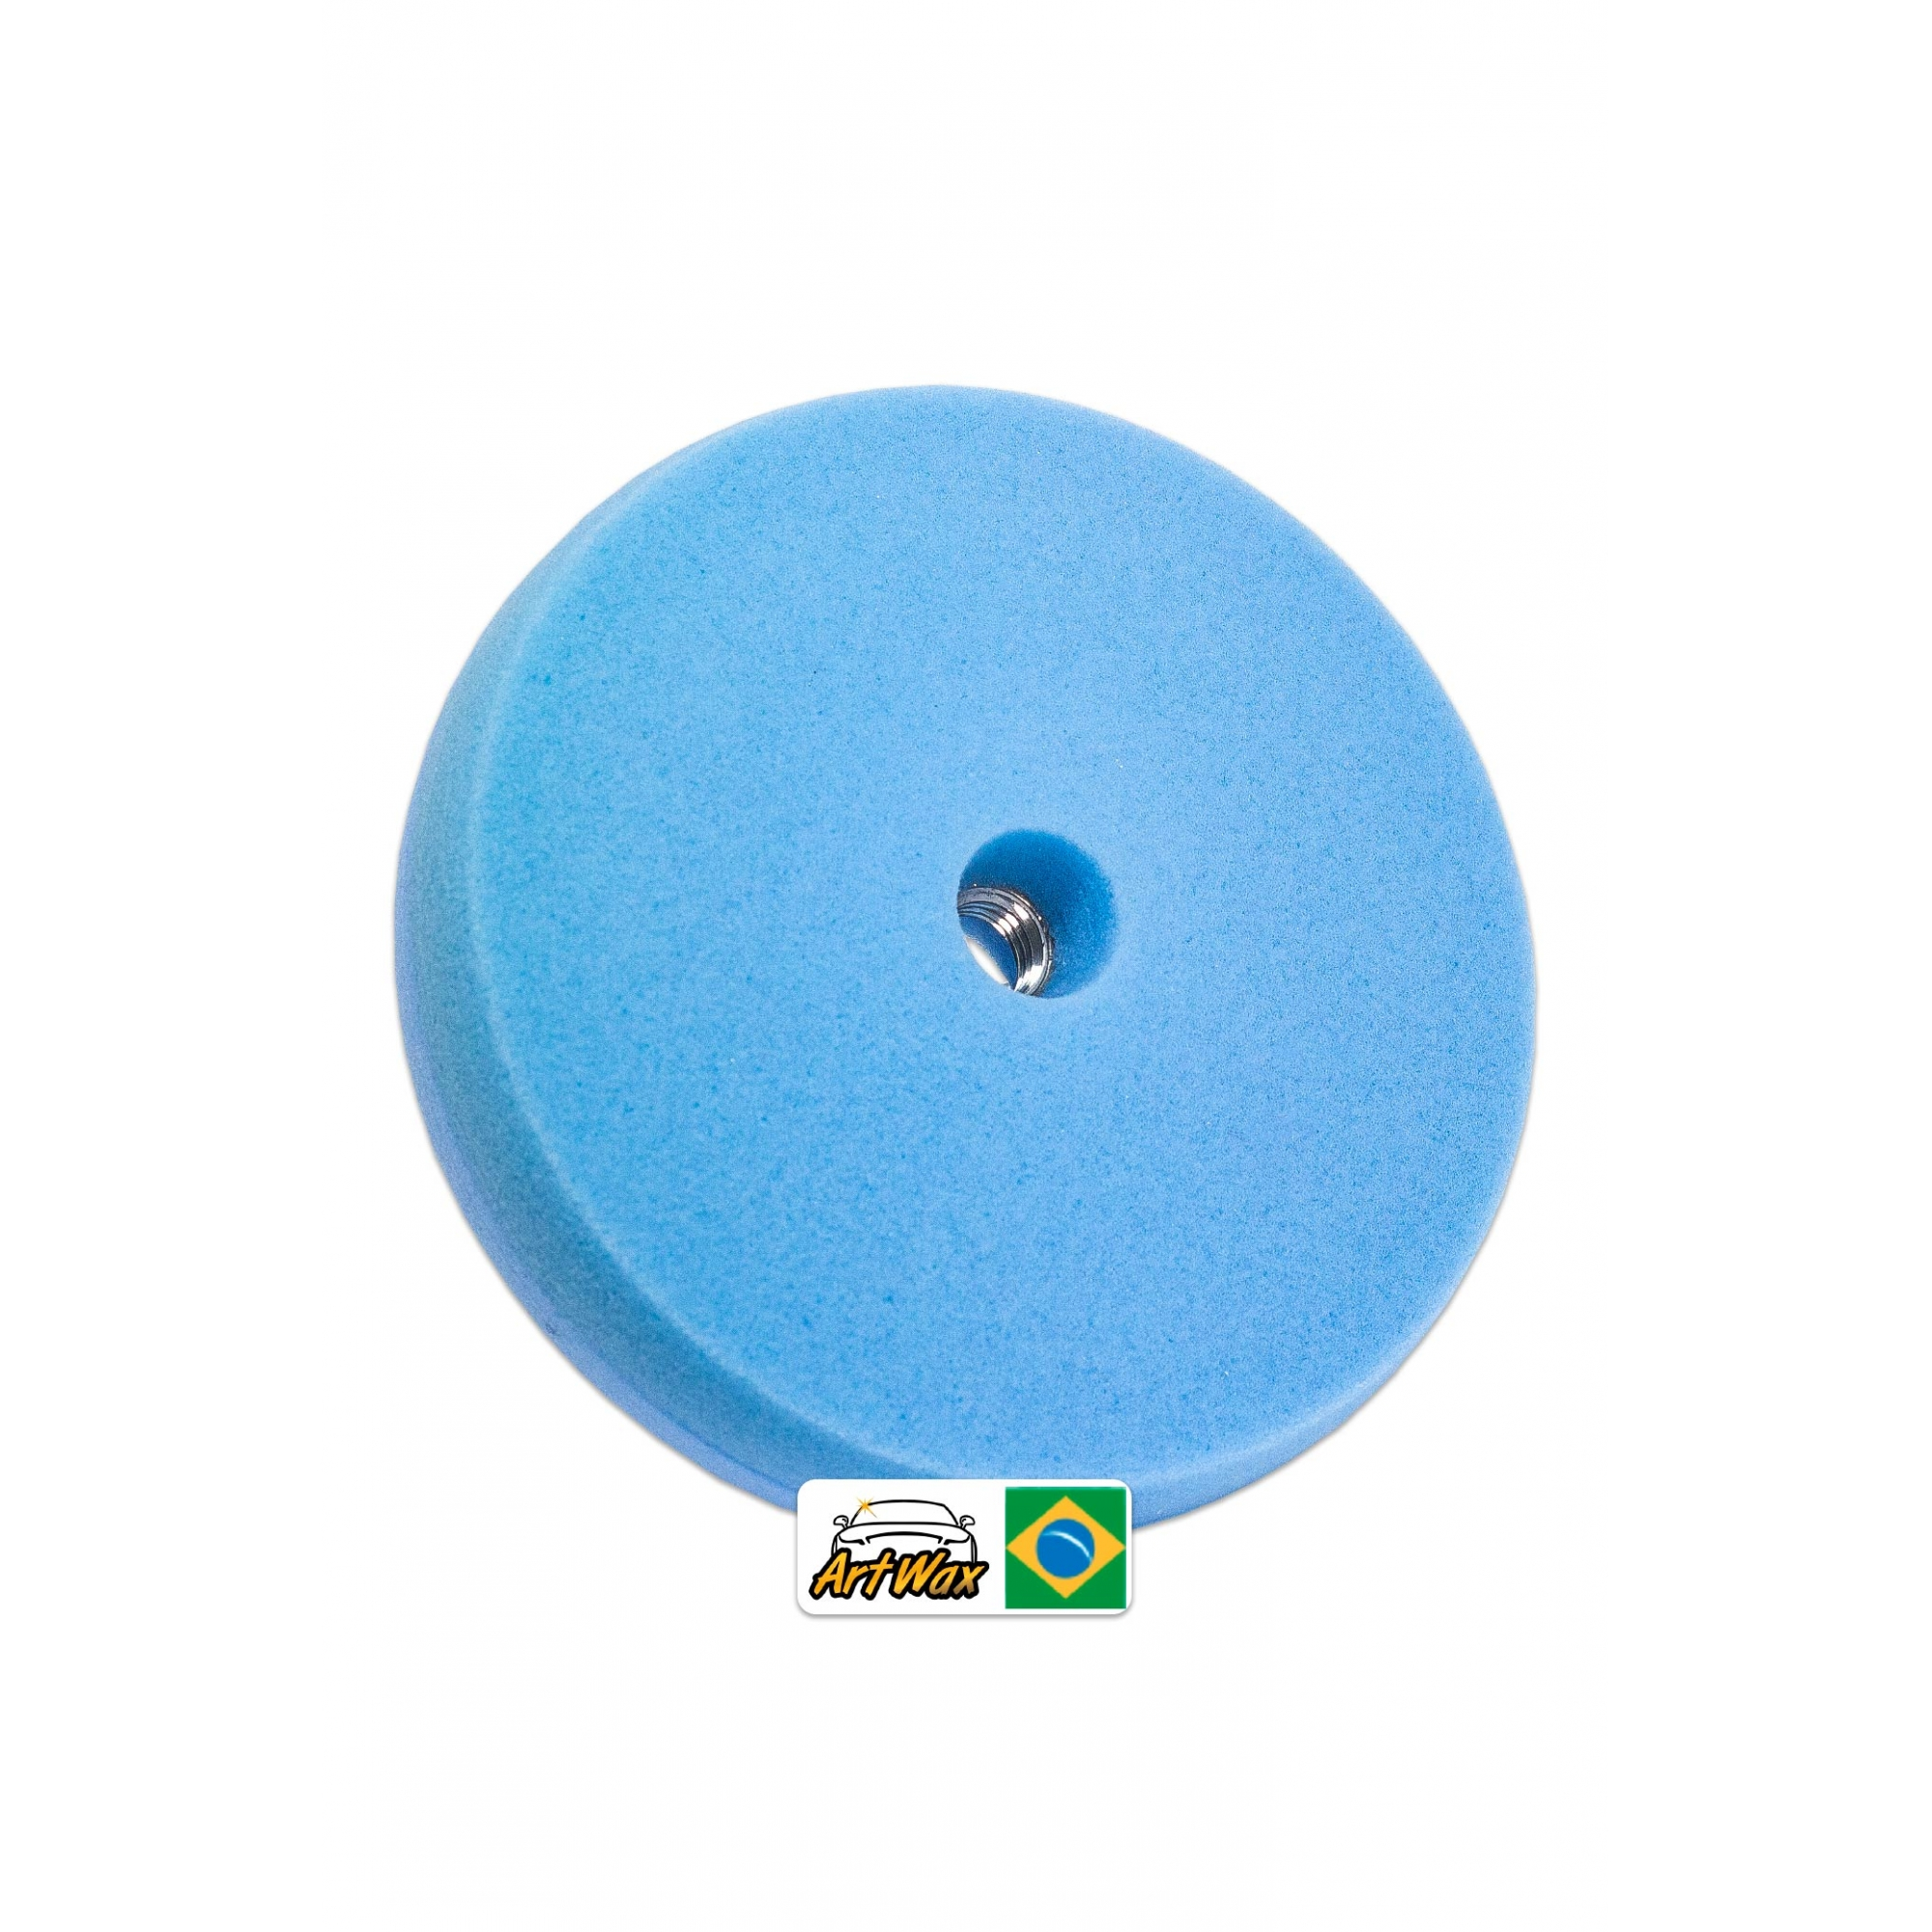 Lincoln Boina Dupla Face Espuma Azul 6